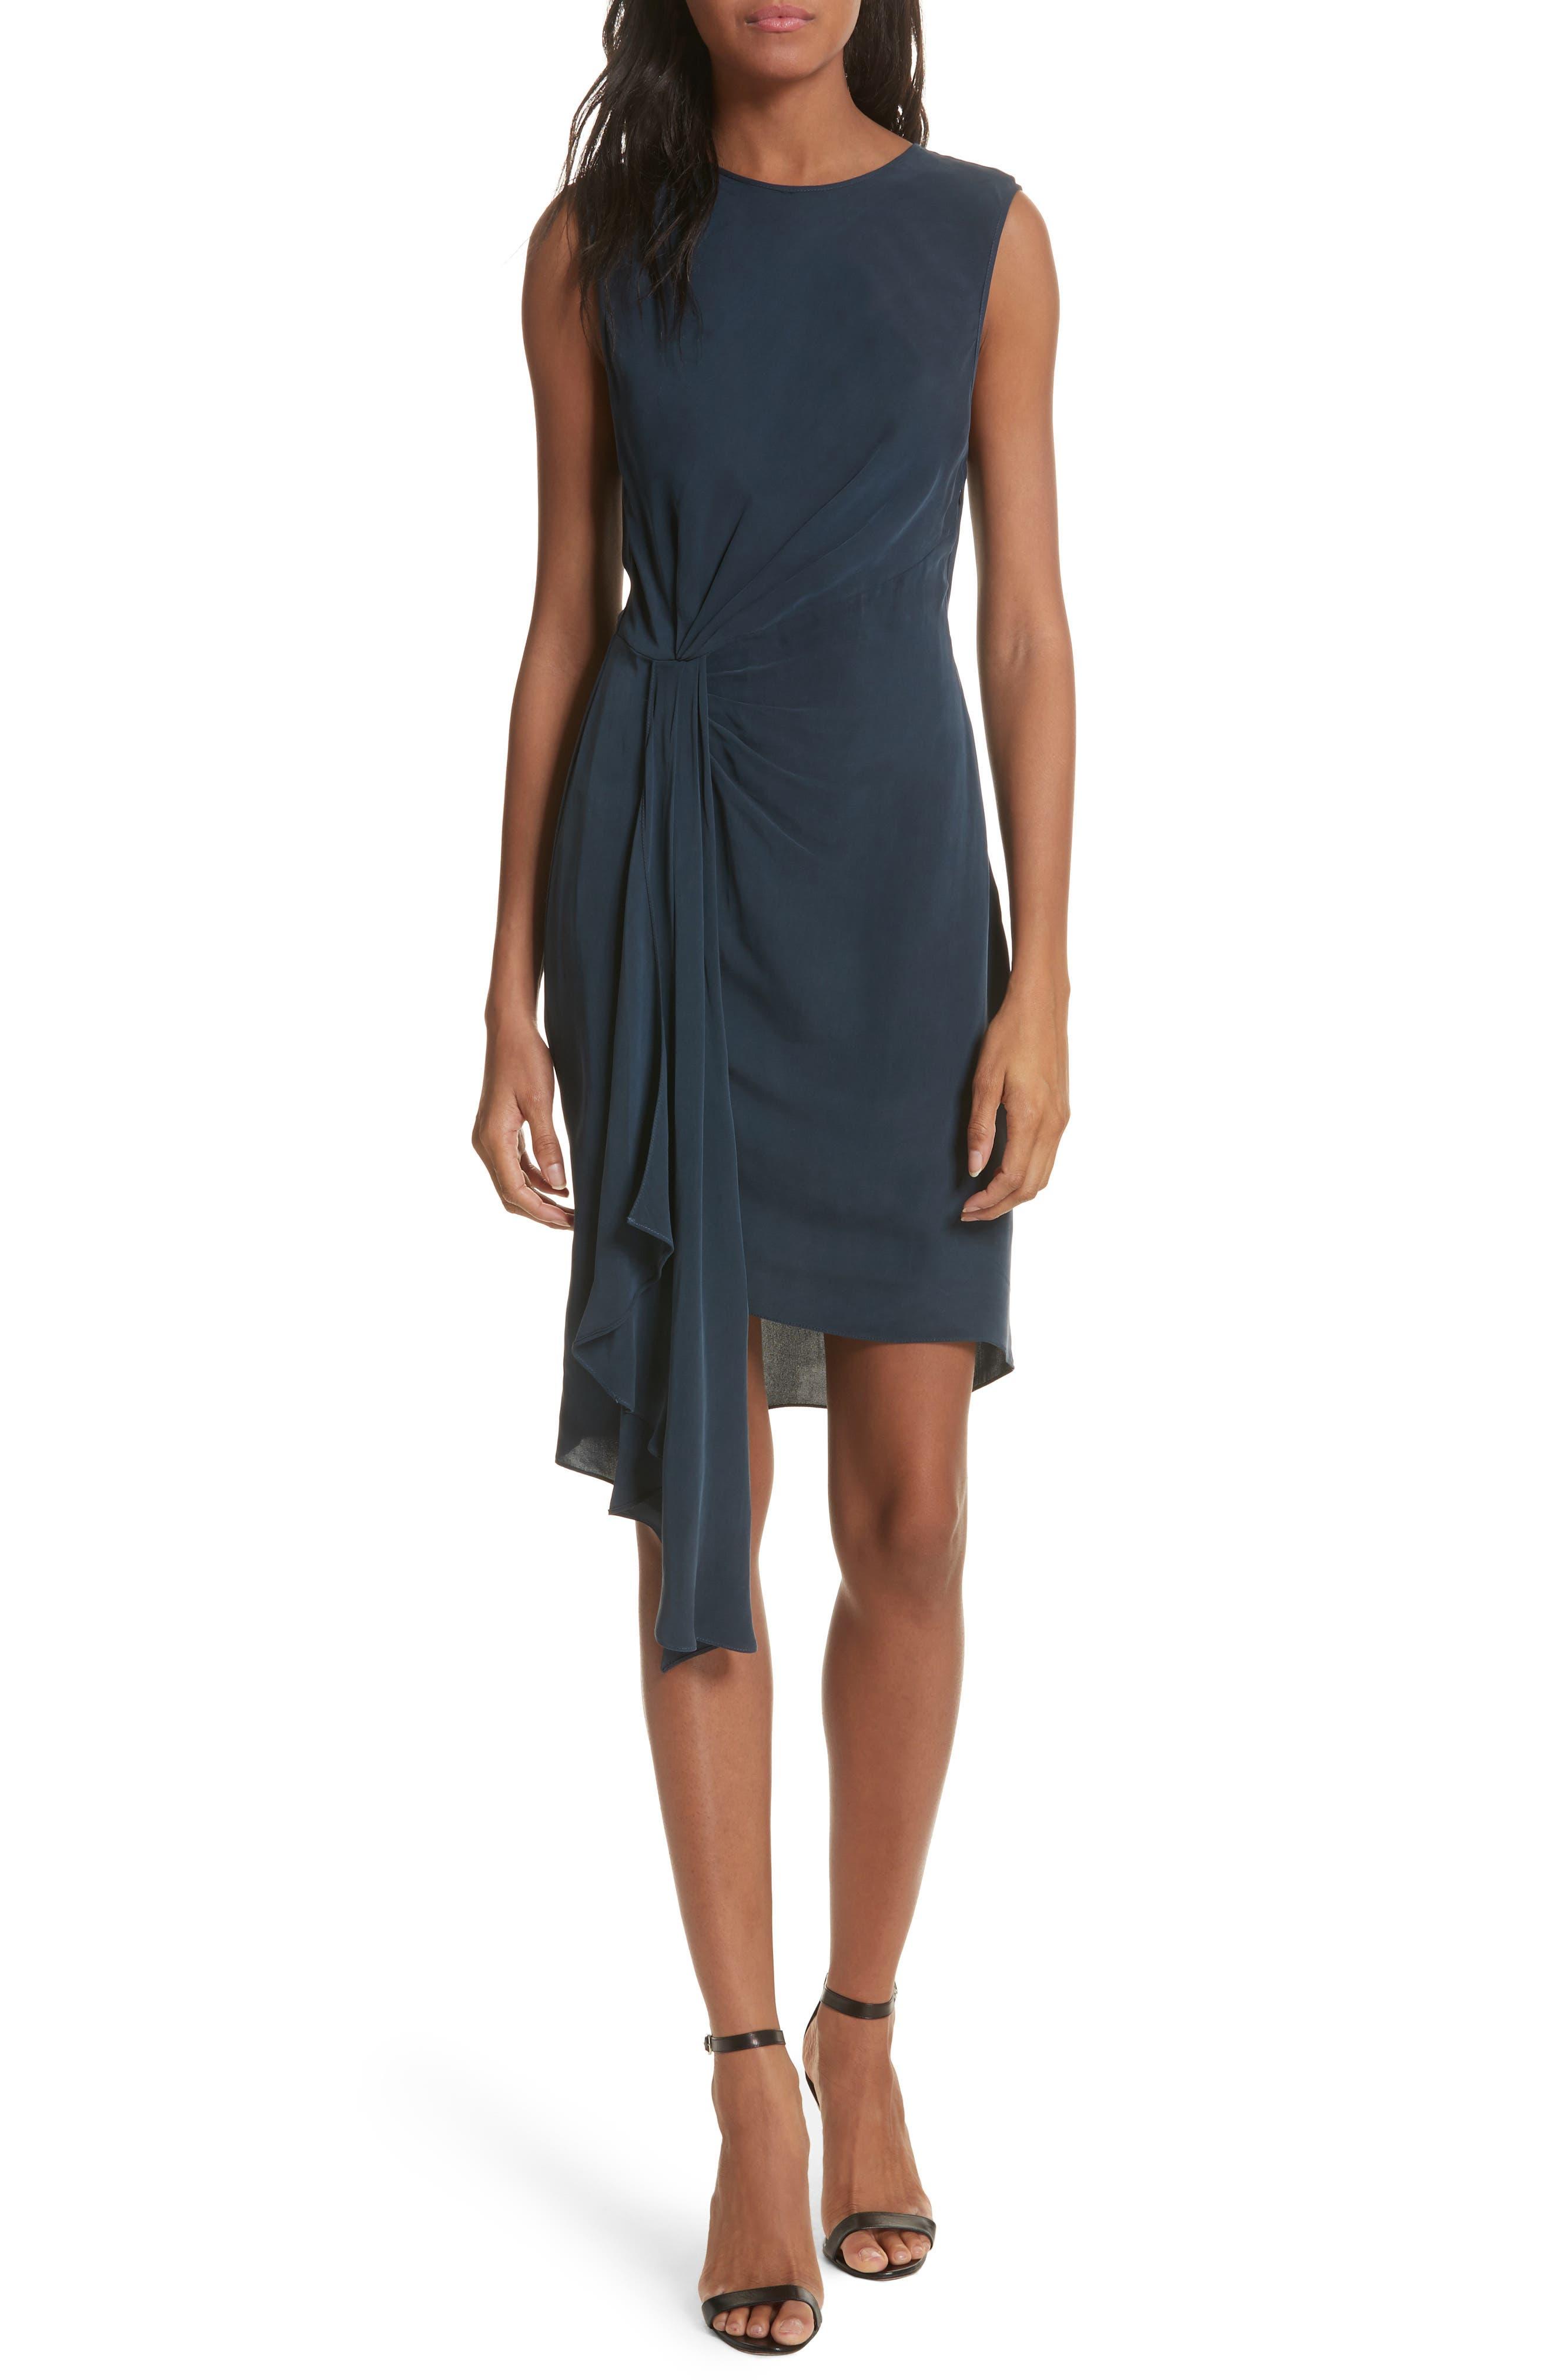 Milly Rachael Front Drape Dress